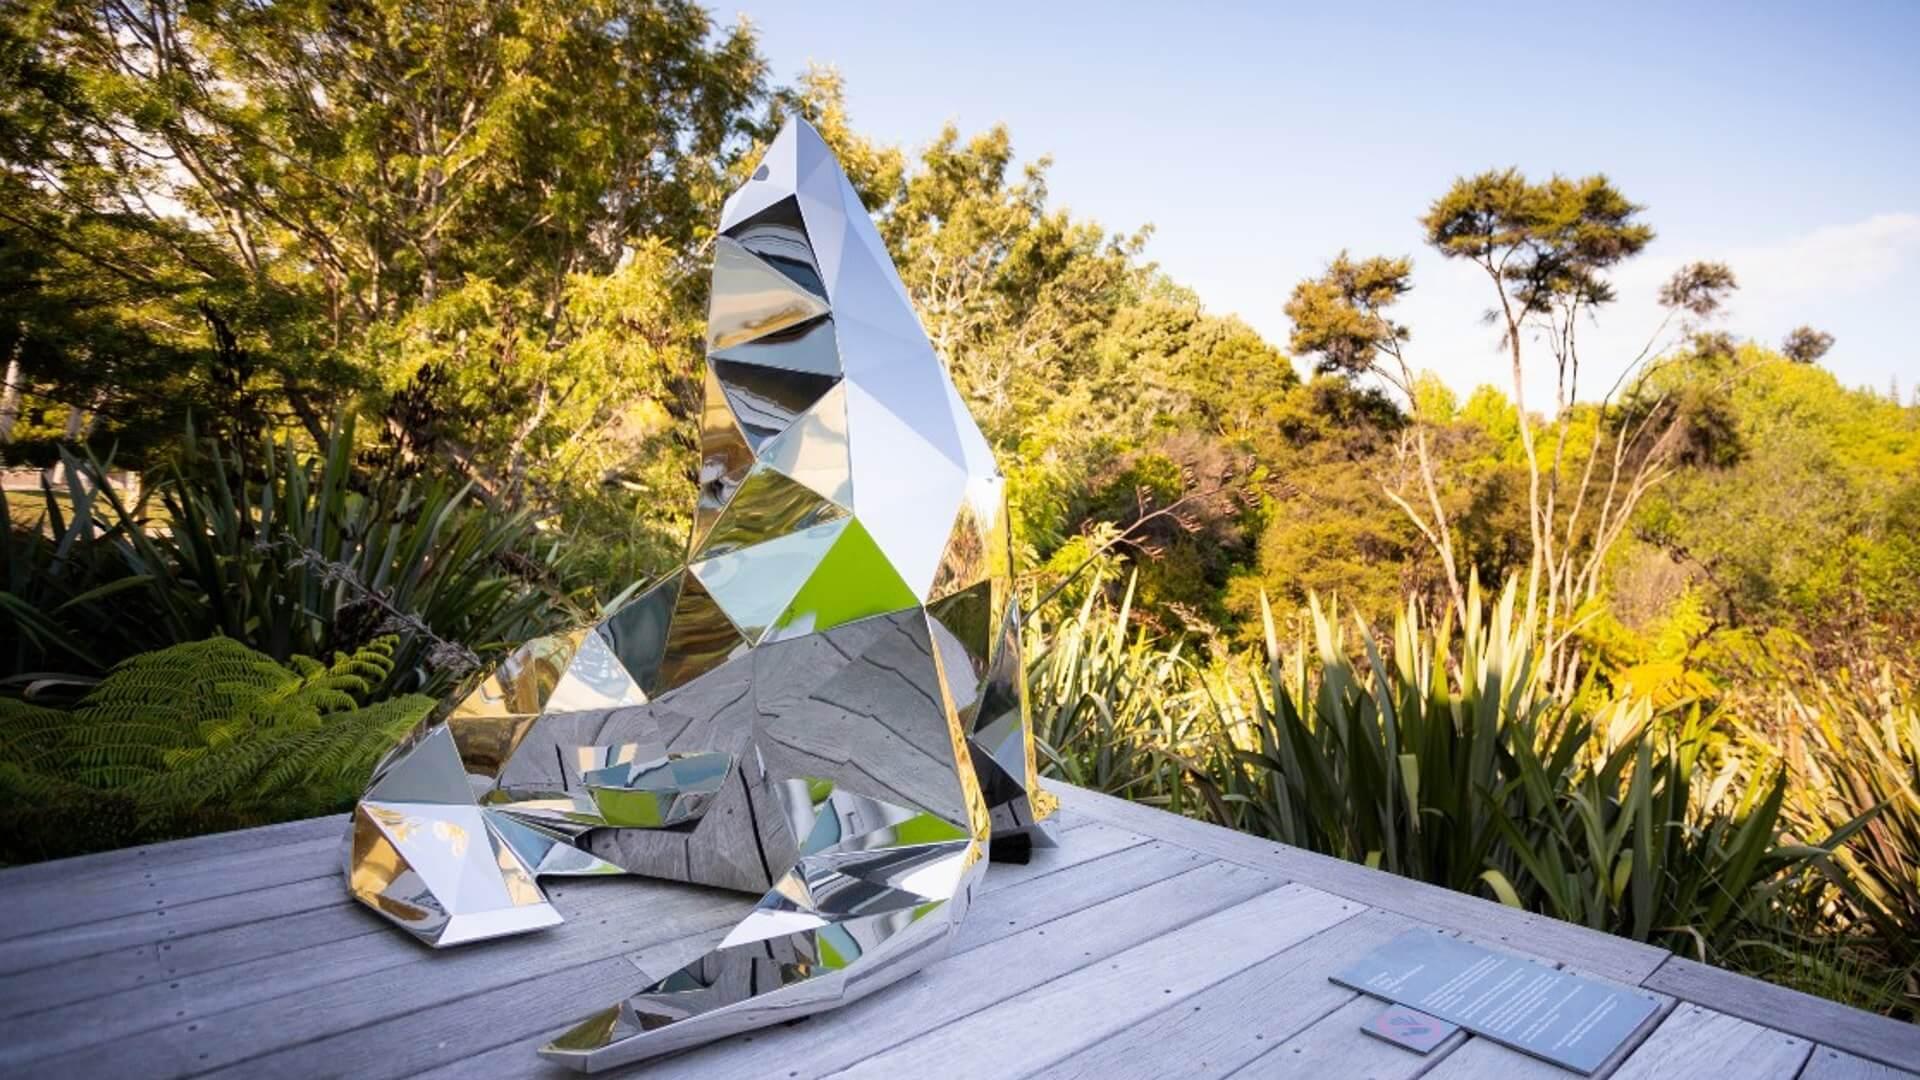 Top 10 things to do with kids Brick Bay Sculpture Trail Matakana Coast